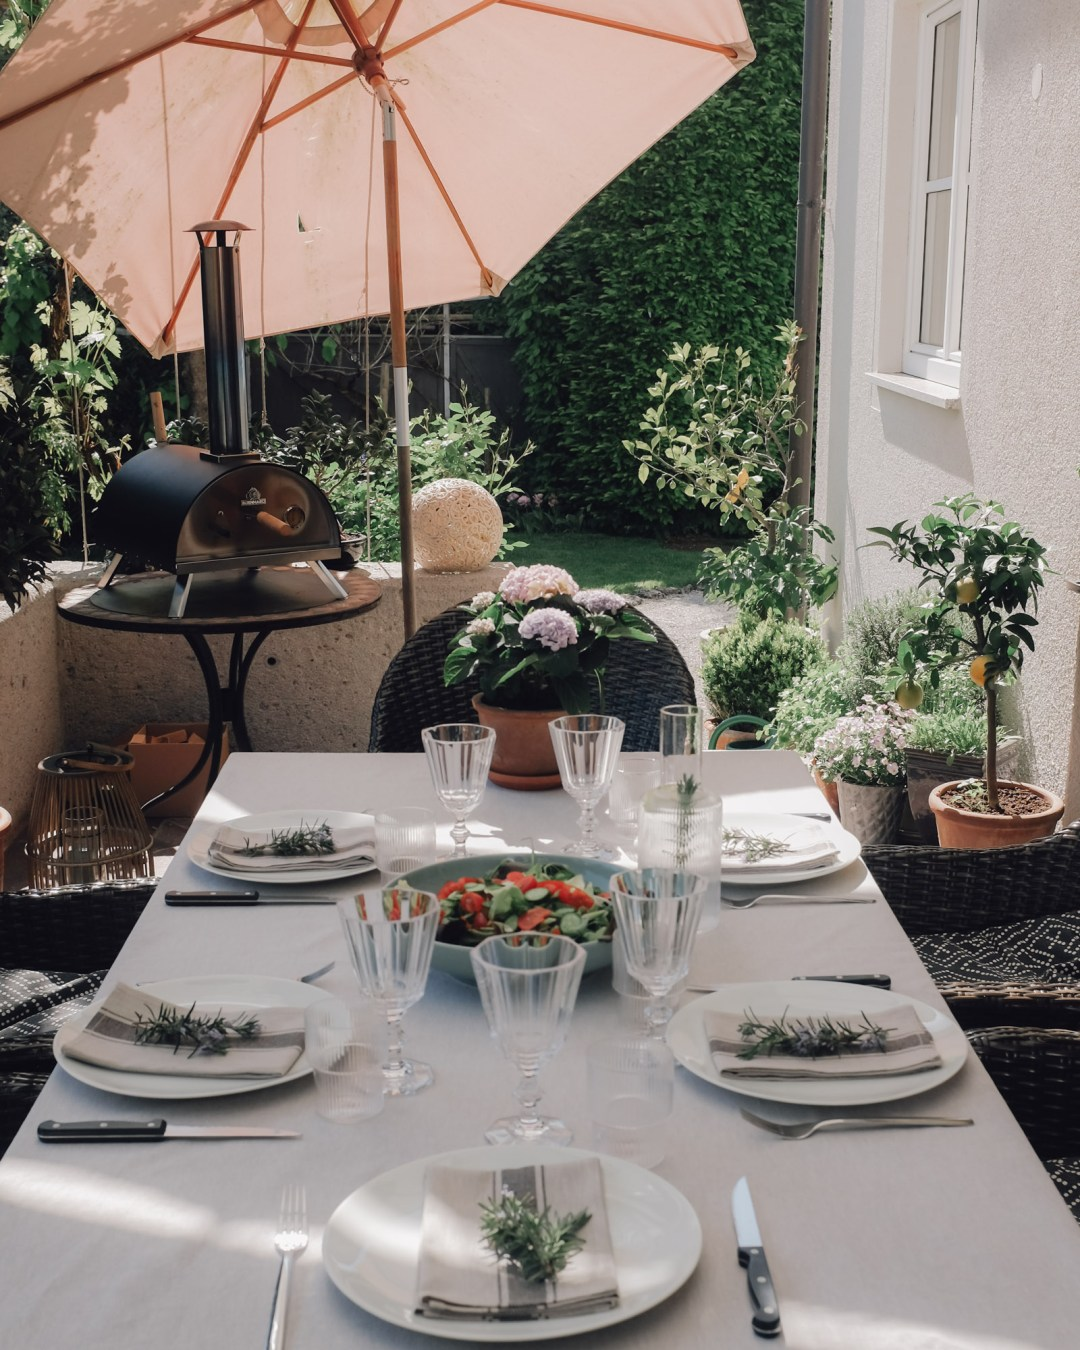 Inastil, Pizza, Pizzaofen, Pizzateig, Tiramisu, Erdbeeren, Erdbeertiramisu, Rezept, Italienische Küche, Italienfeeling, Terrasse-19